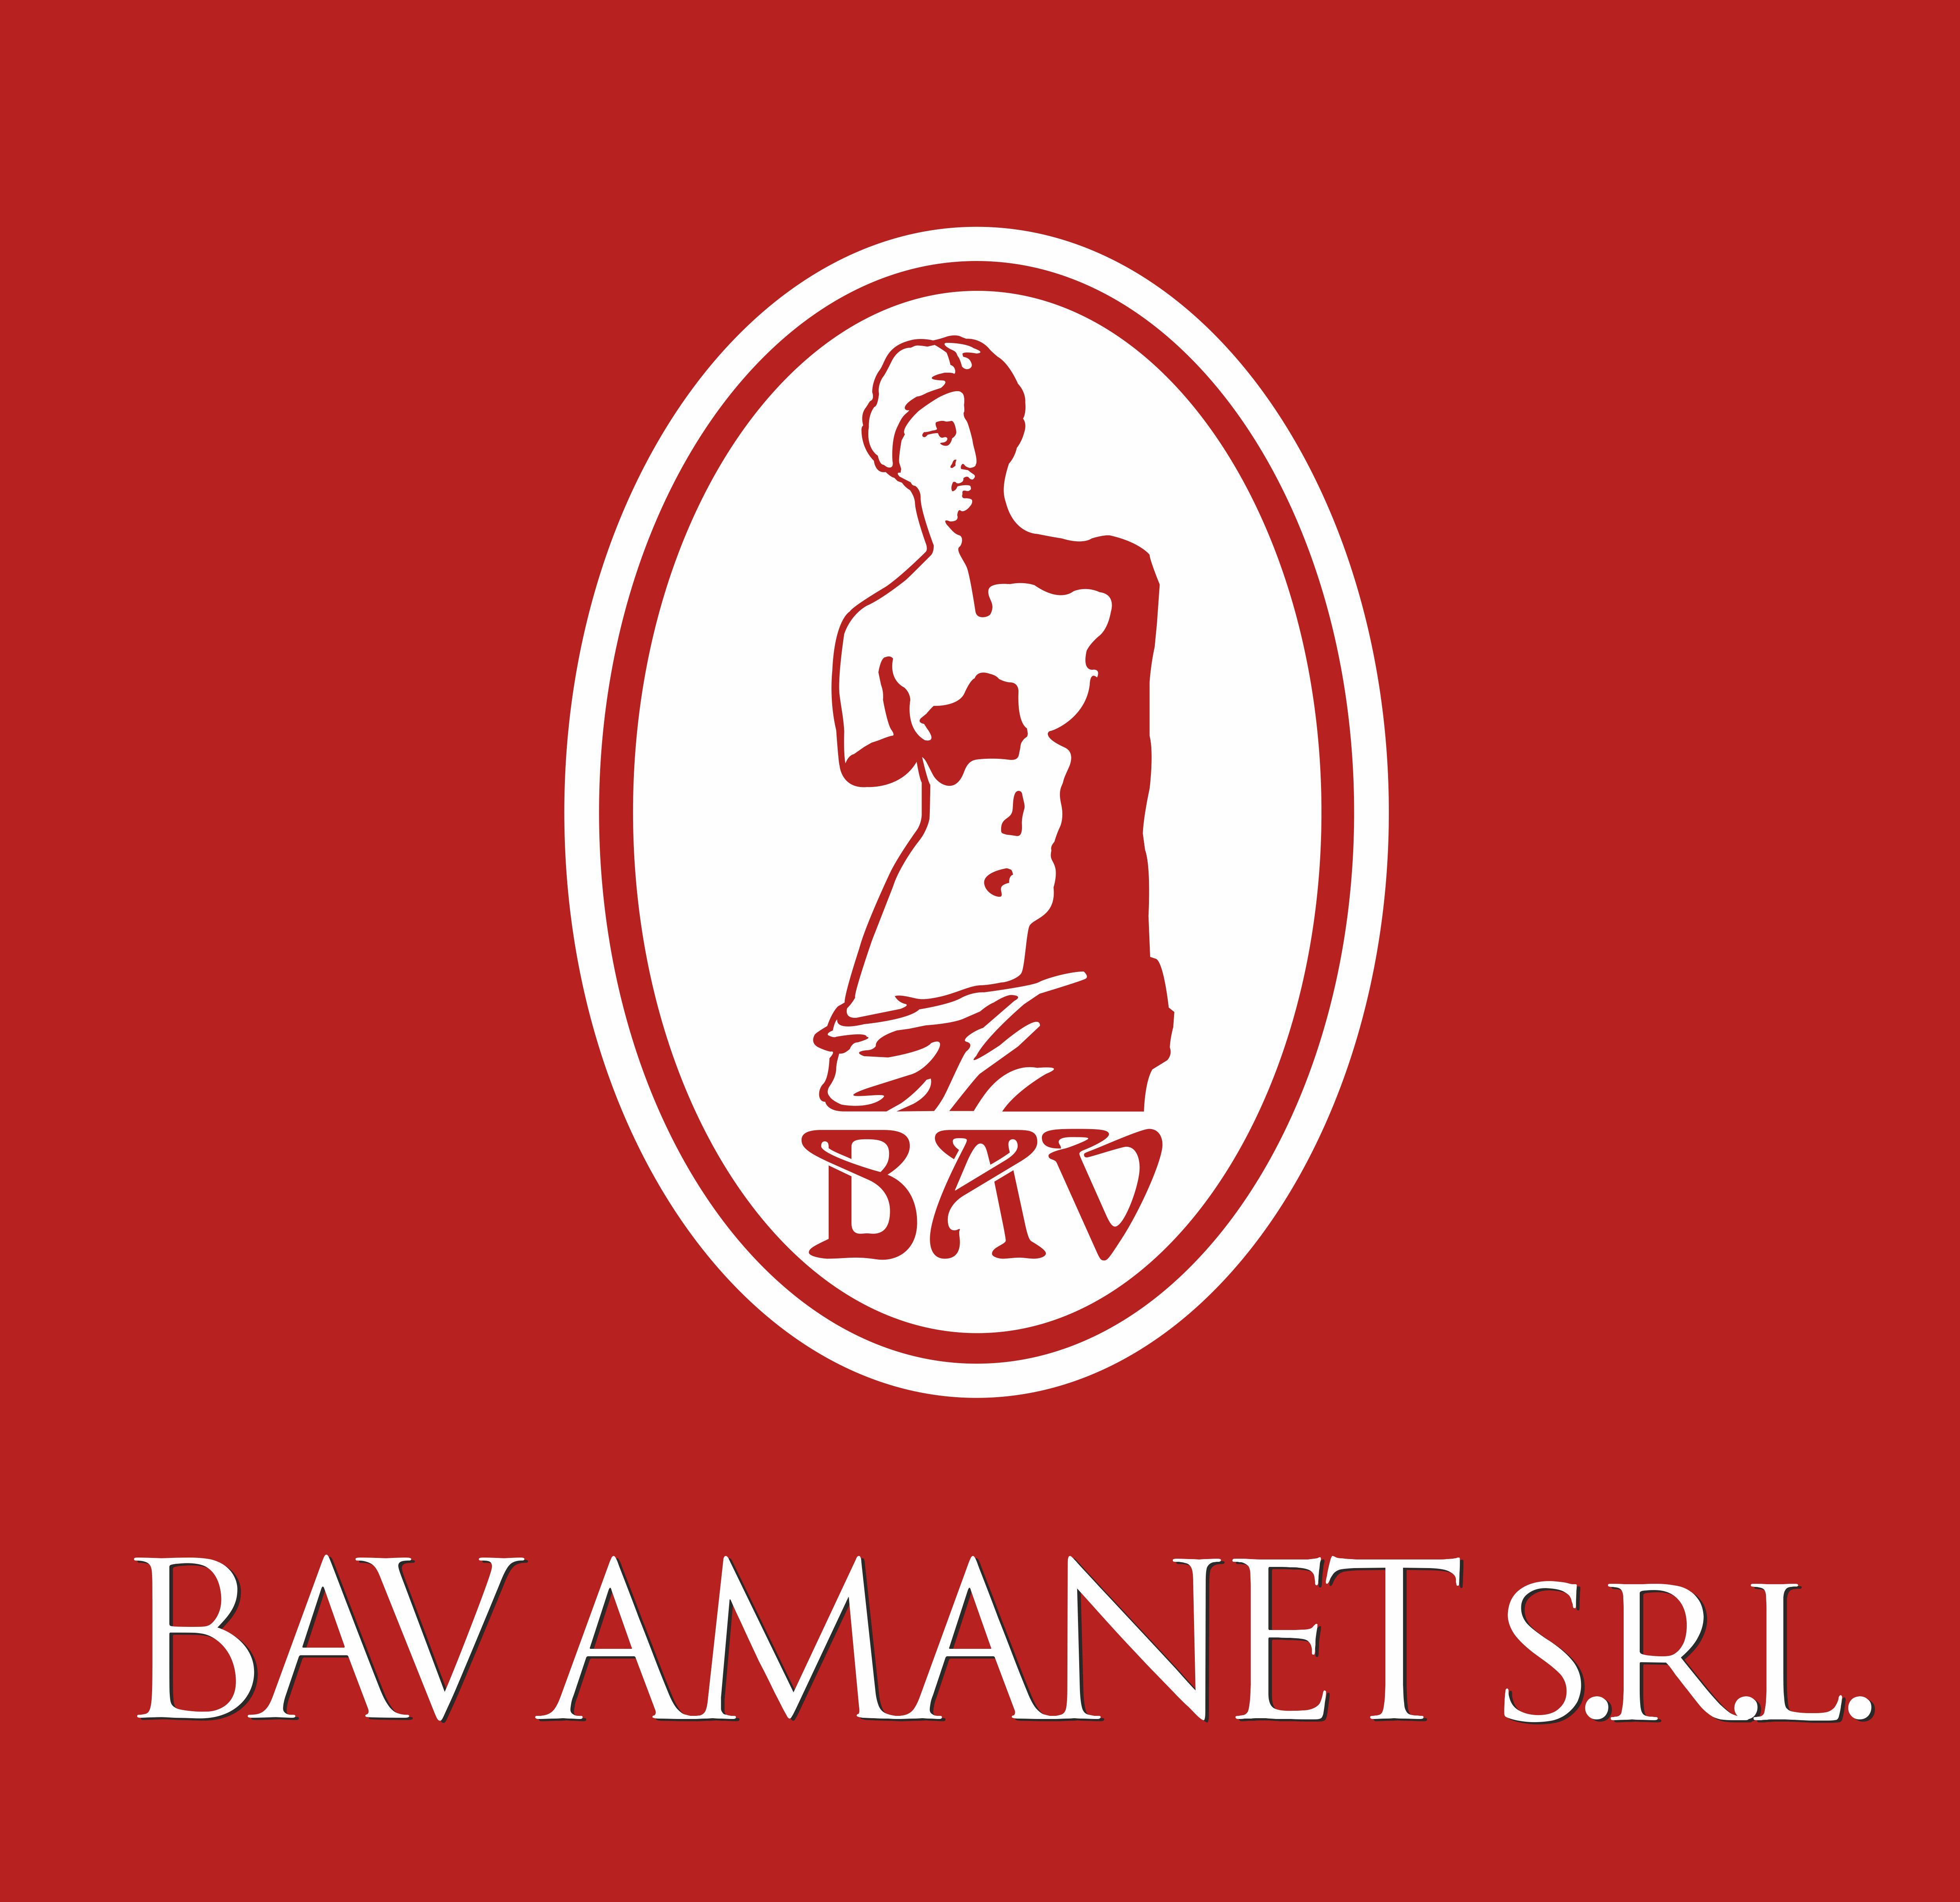 BAV Amanet srl logo